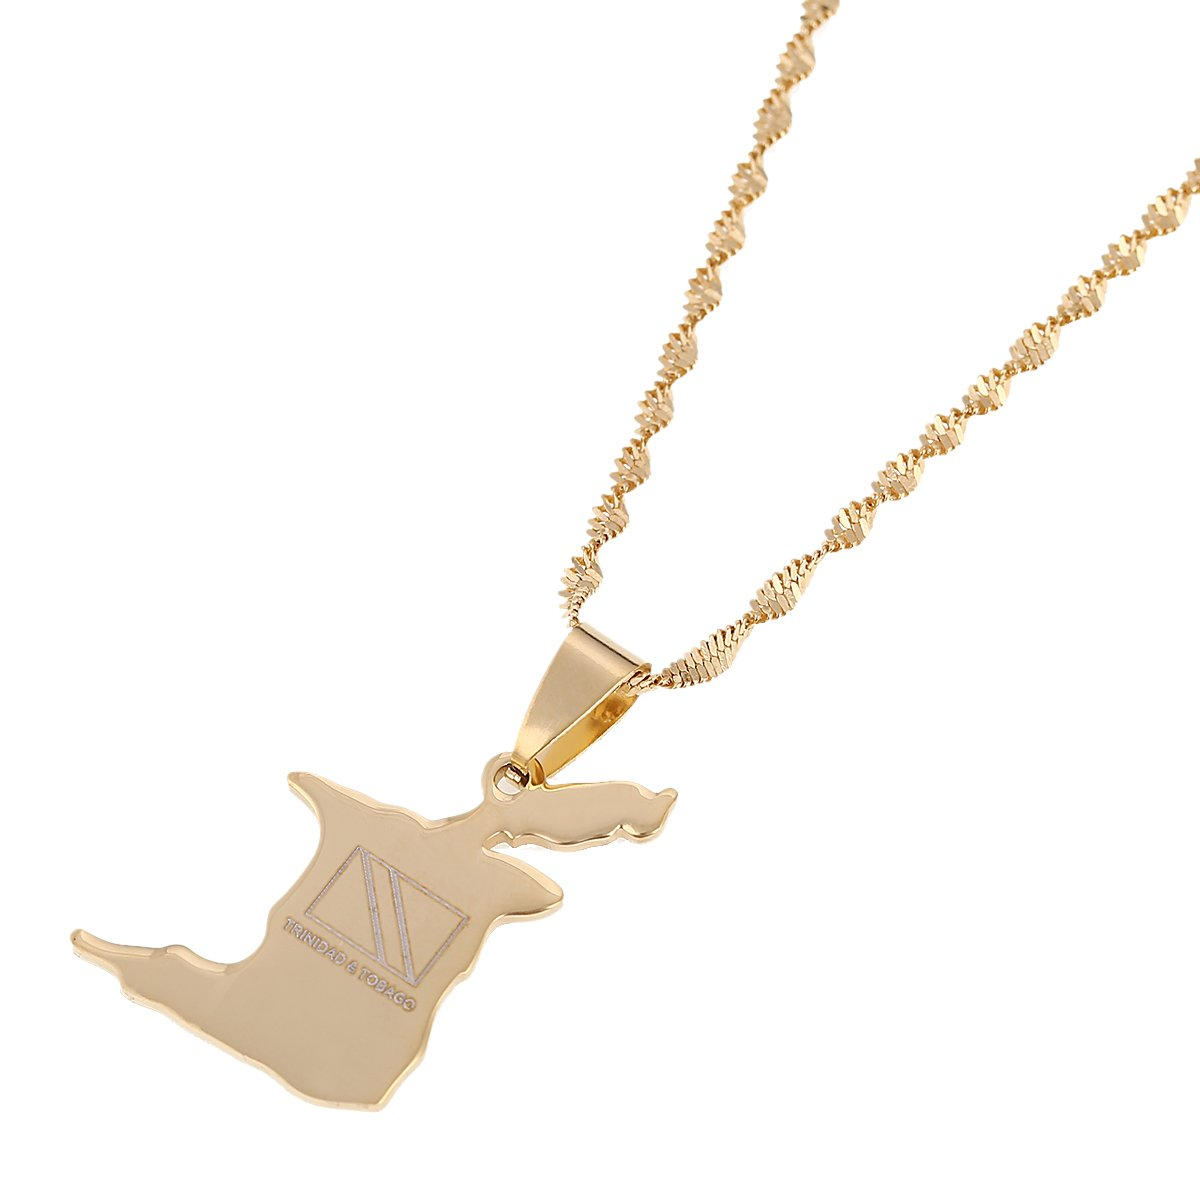 Popular Little Swan White Choker Necklace Gold Chain Pendant Fashion Gift Women